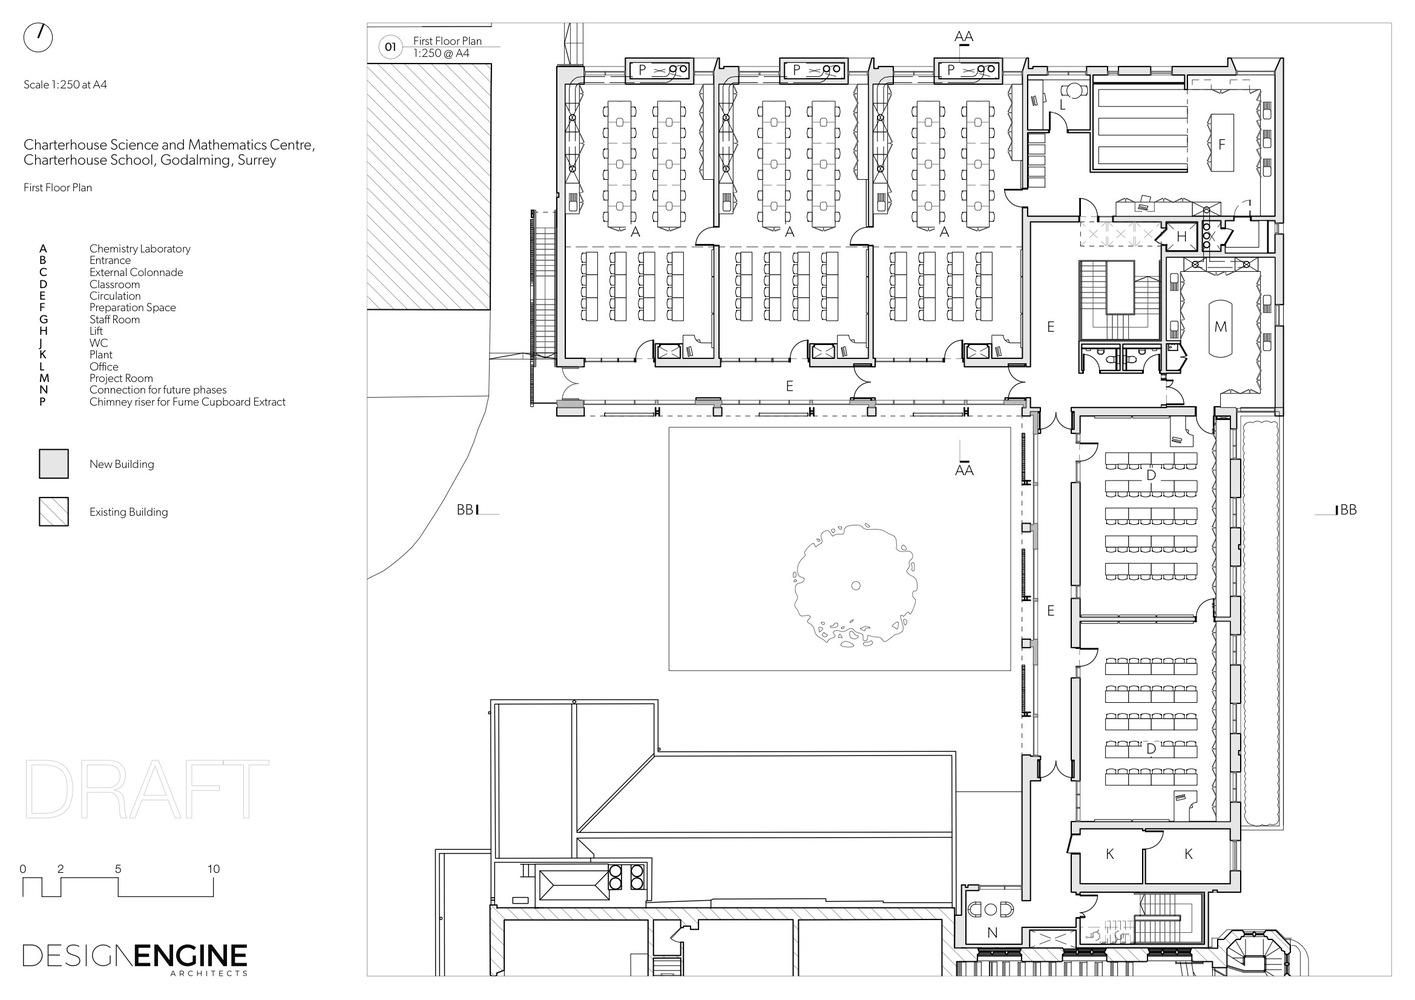 medium resolution of charterhouse science mathematics centre design engine architects first floor plan